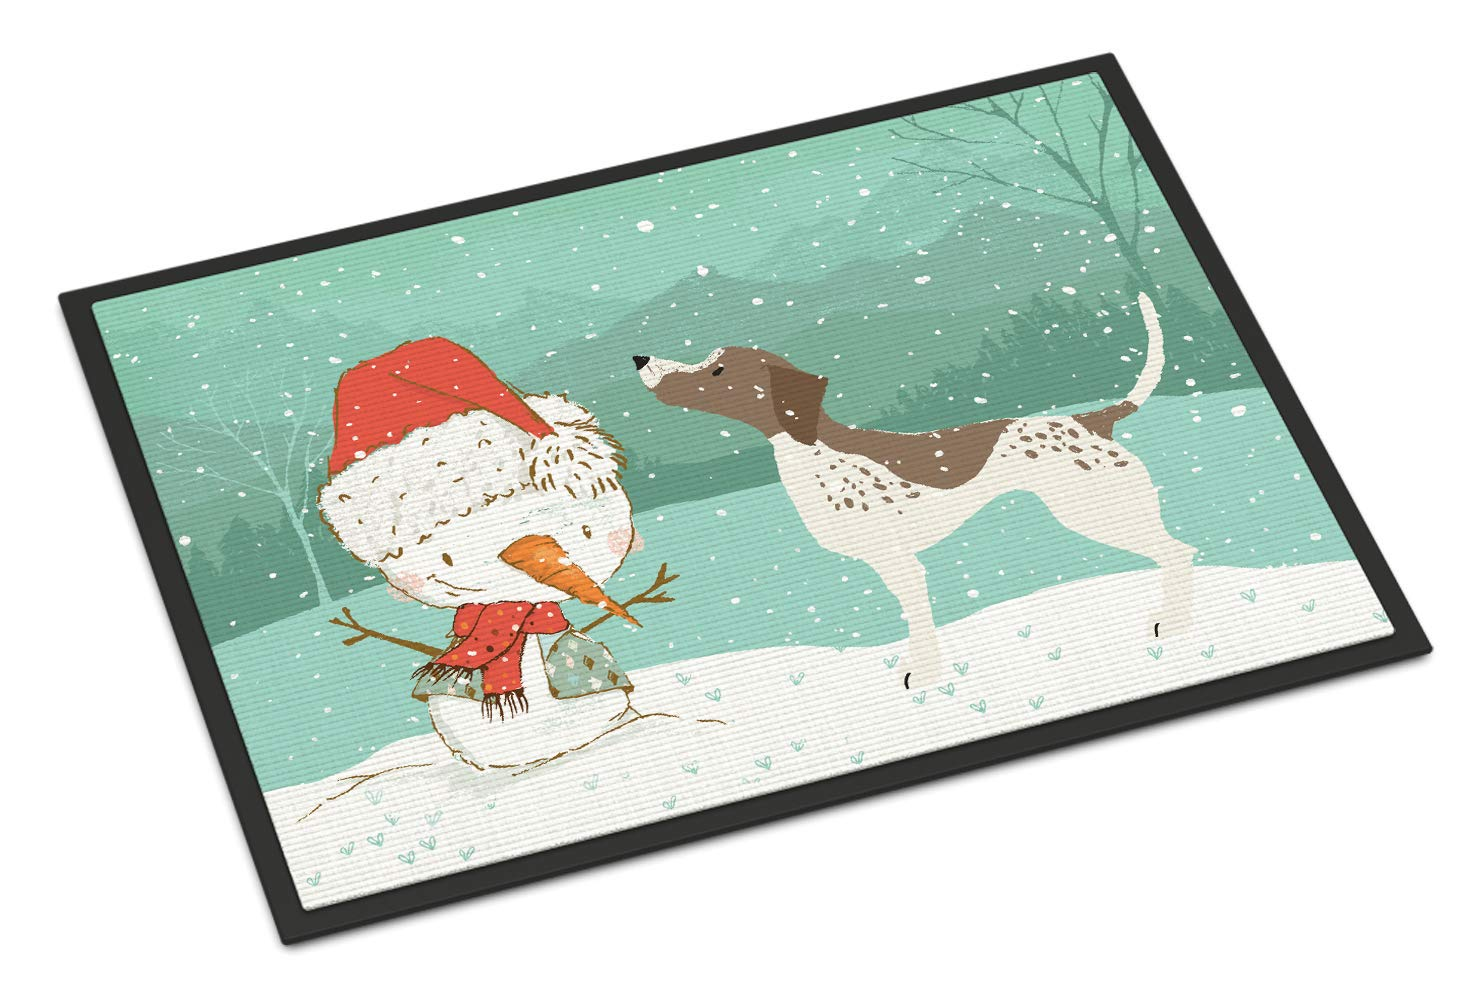 Carolines Treasures CK2045MAT German Shorthair Snowman Christmas Indoor or Outdoor Mat 18x27 18H X 27W Multicolor